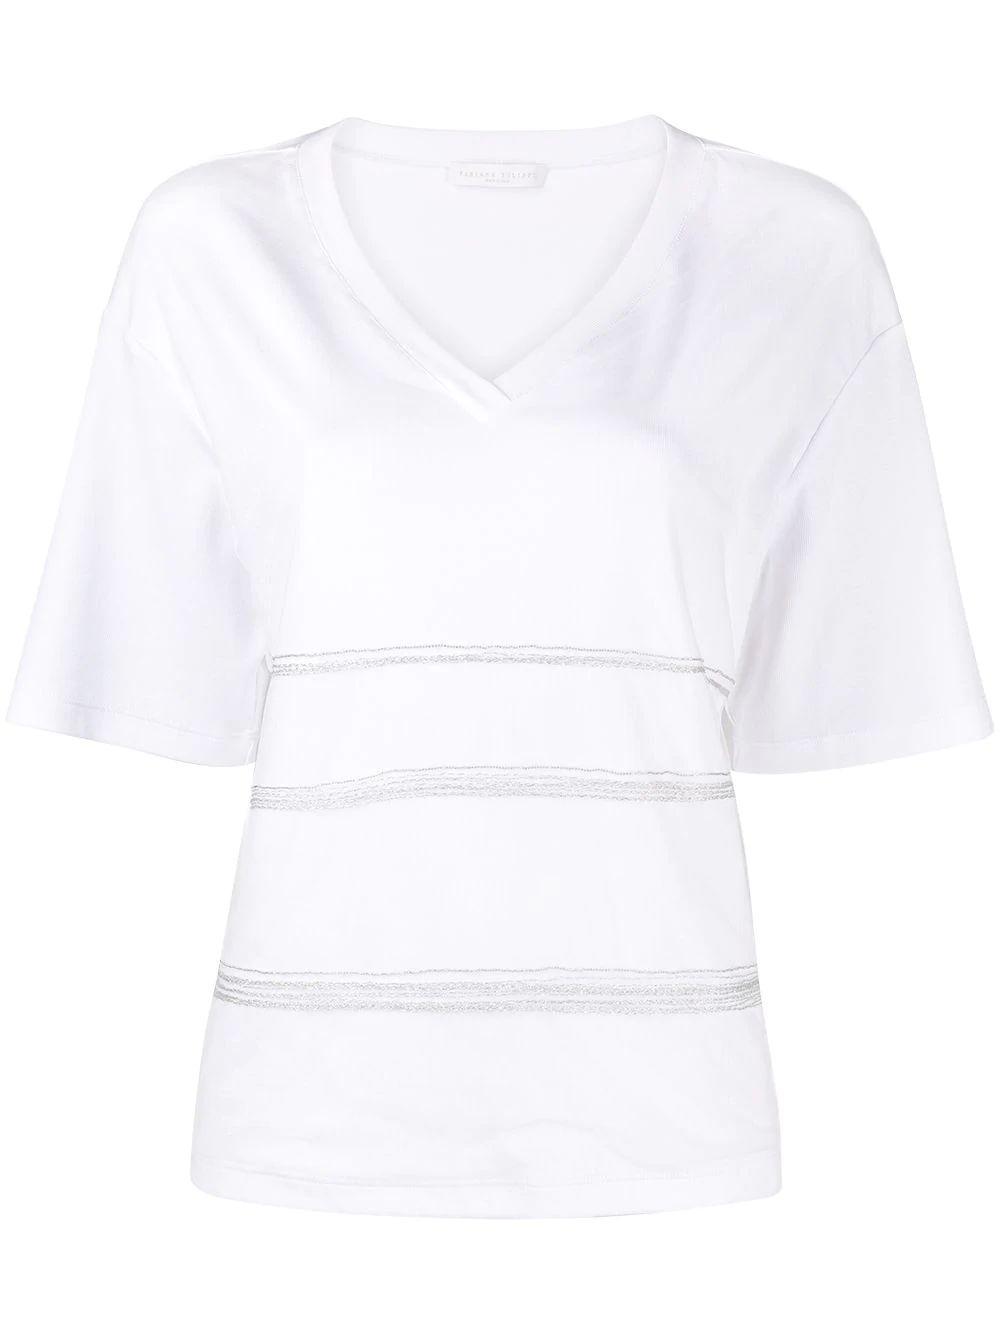 Beaded Detail T-Shirt